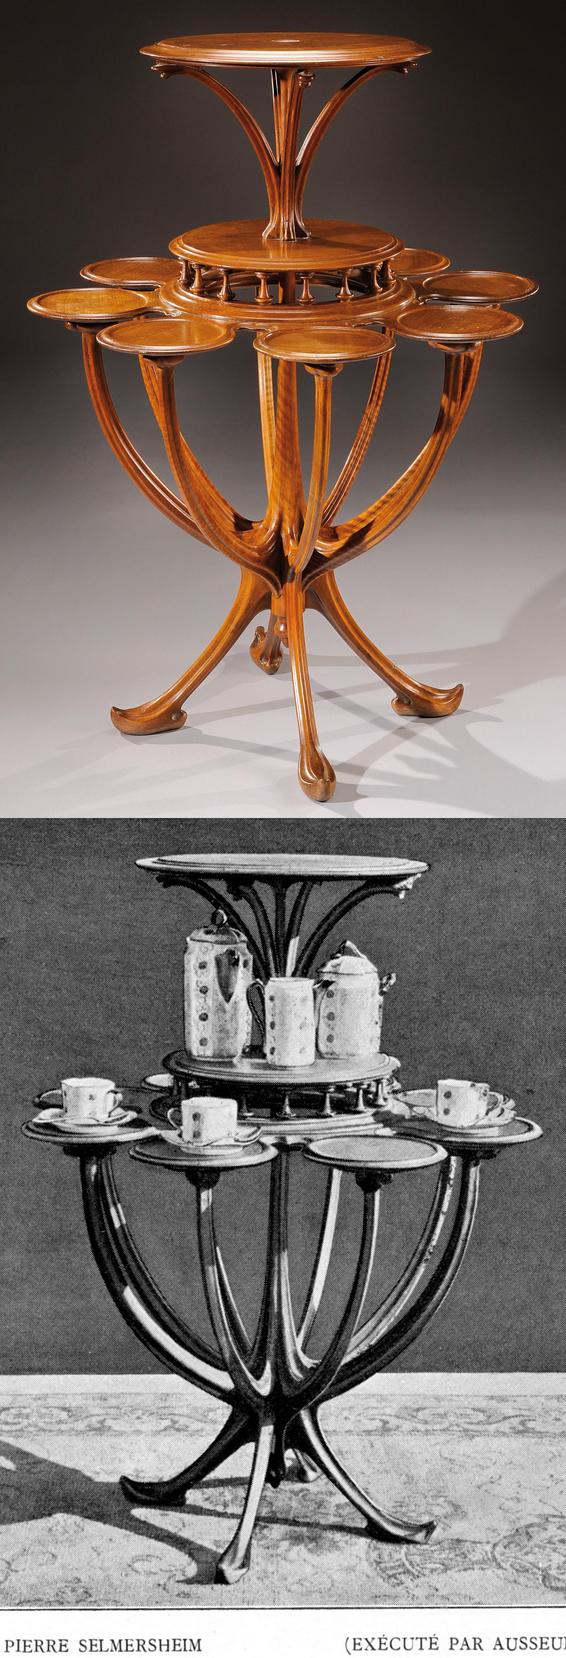 desserte en noyer tony selmersheim 1900 art nouveau stuffs pinterest desserte noyer. Black Bedroom Furniture Sets. Home Design Ideas